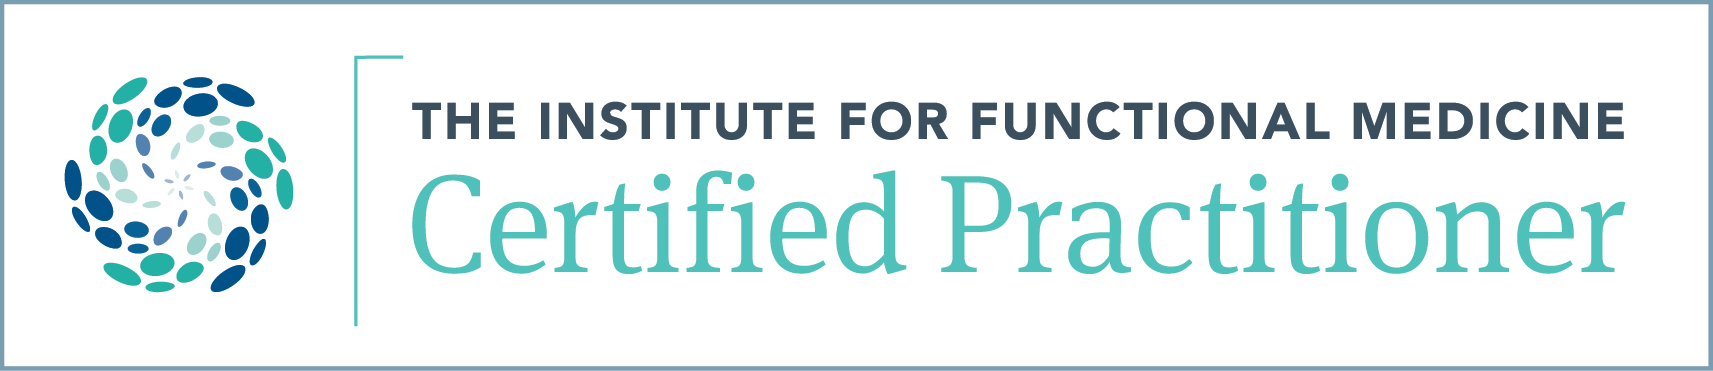 IFM certified functional medicine practitioner